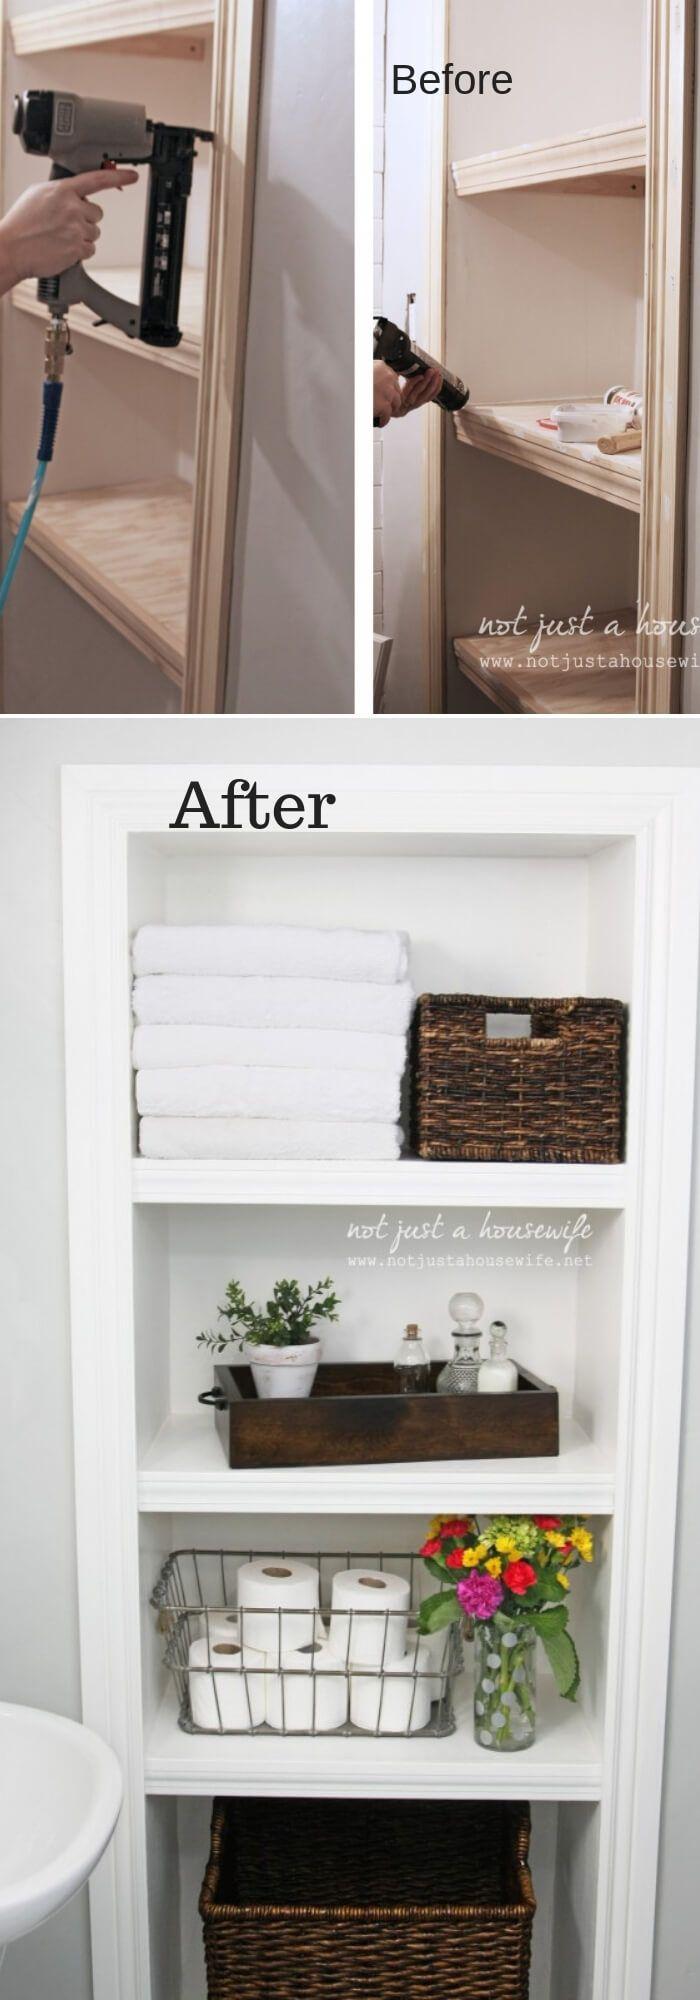 21 totally inspiring bathroom organization shelves to